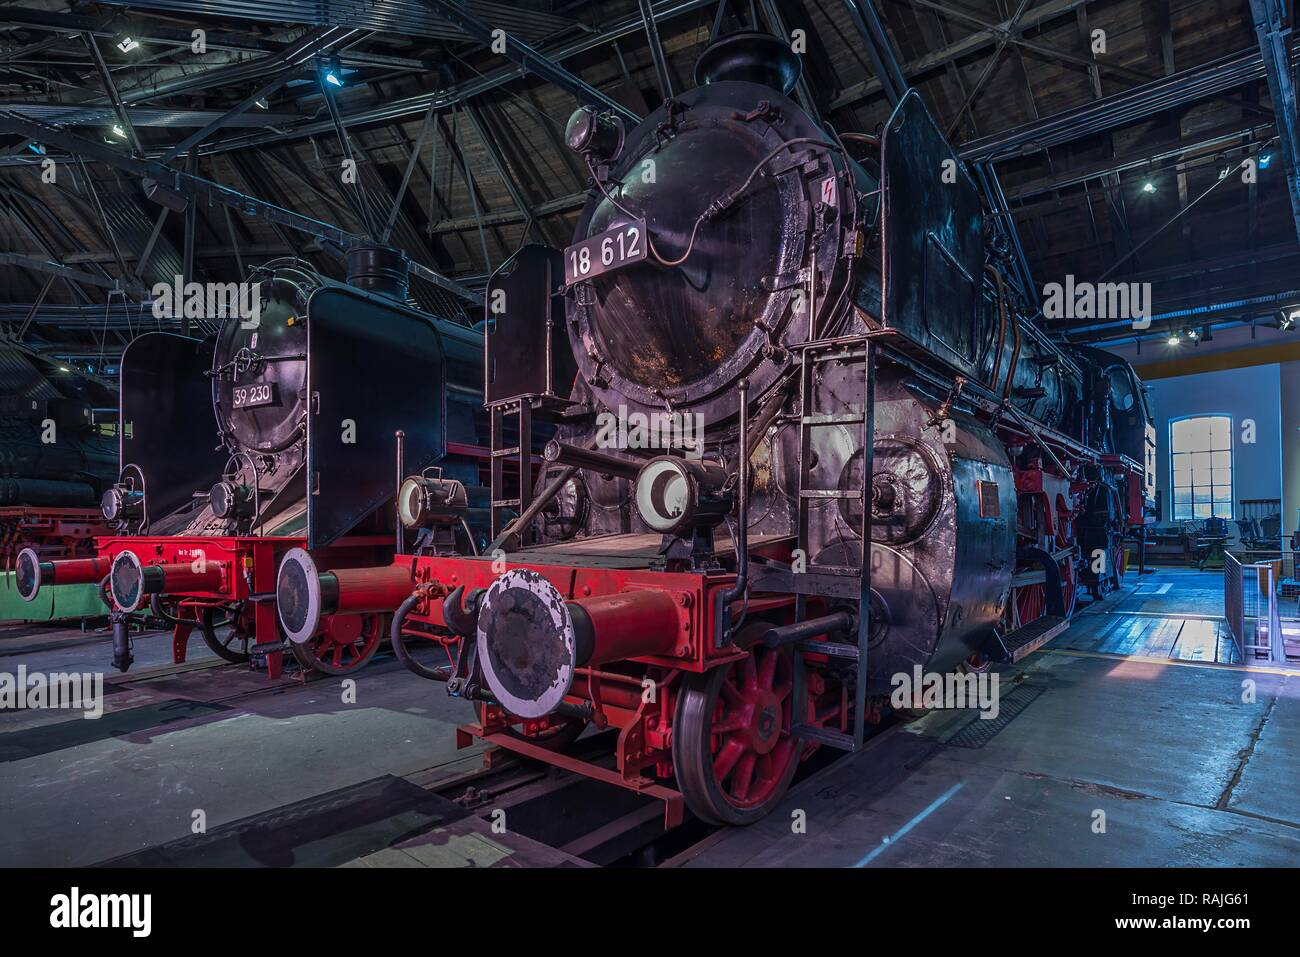 Steam Locomotives 39 230 and 18 612 in the Ringlokschuppen, German Steam Locomotive Museum, Neuenmarkt, Upper Franconia, Bavaria - Stock Image